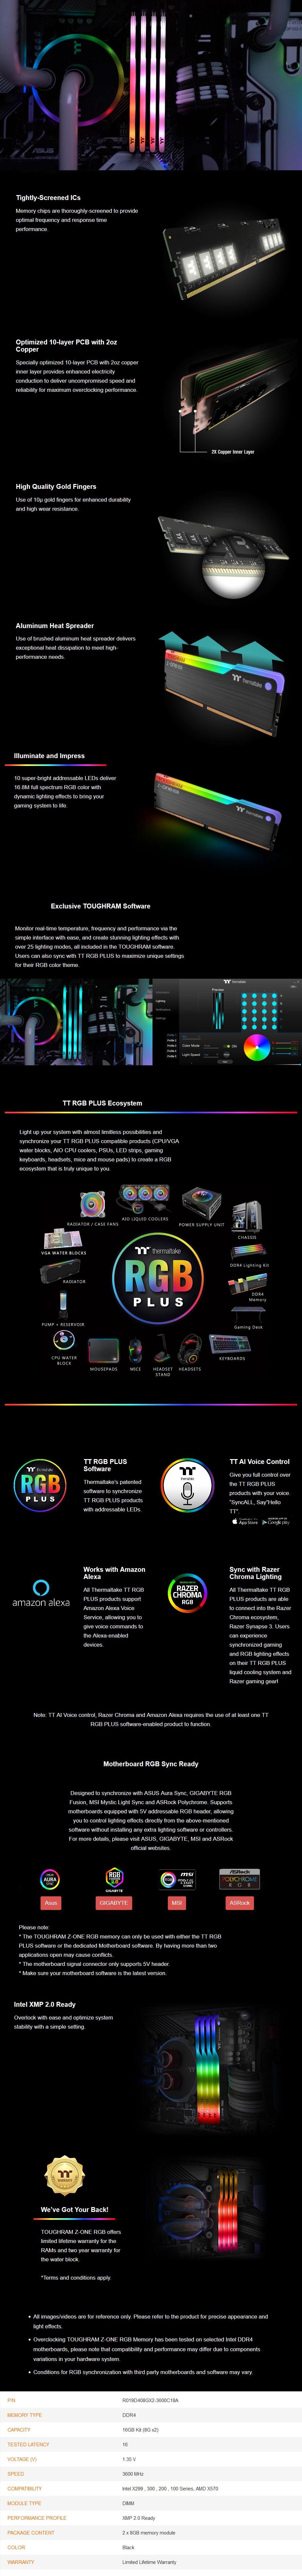 thermaltake-toughram-zone-rgb-16gb-2x-8gb-ddr4-3600mhz-memory-black-ac32808-7.jpg